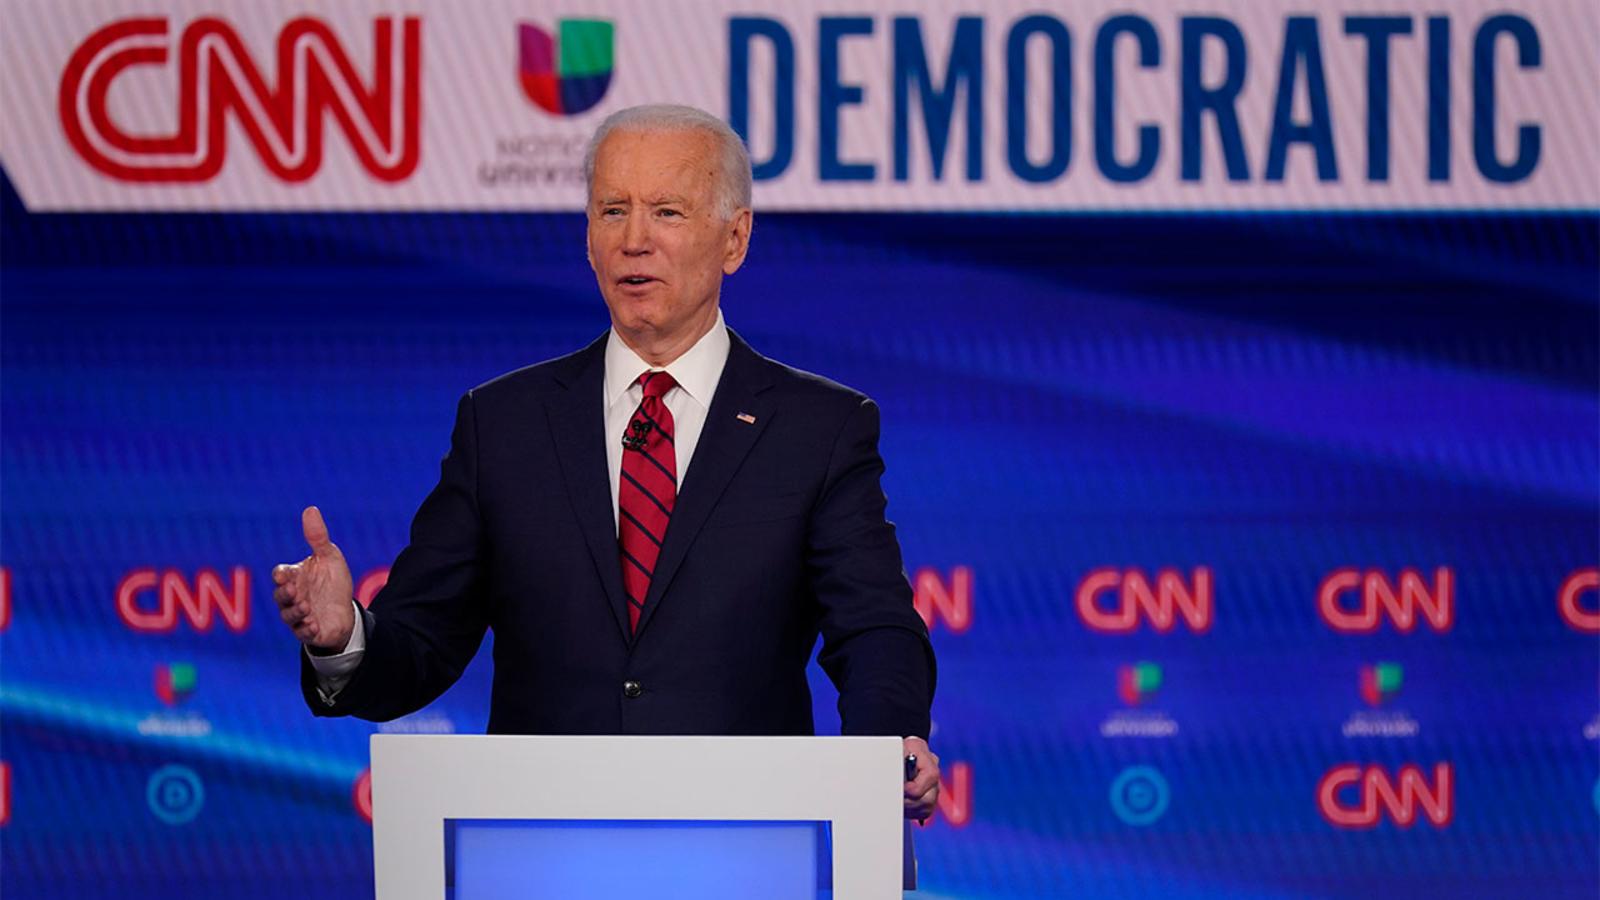 Joe Biden won't go to Milwaukee to accept Democratic nomination